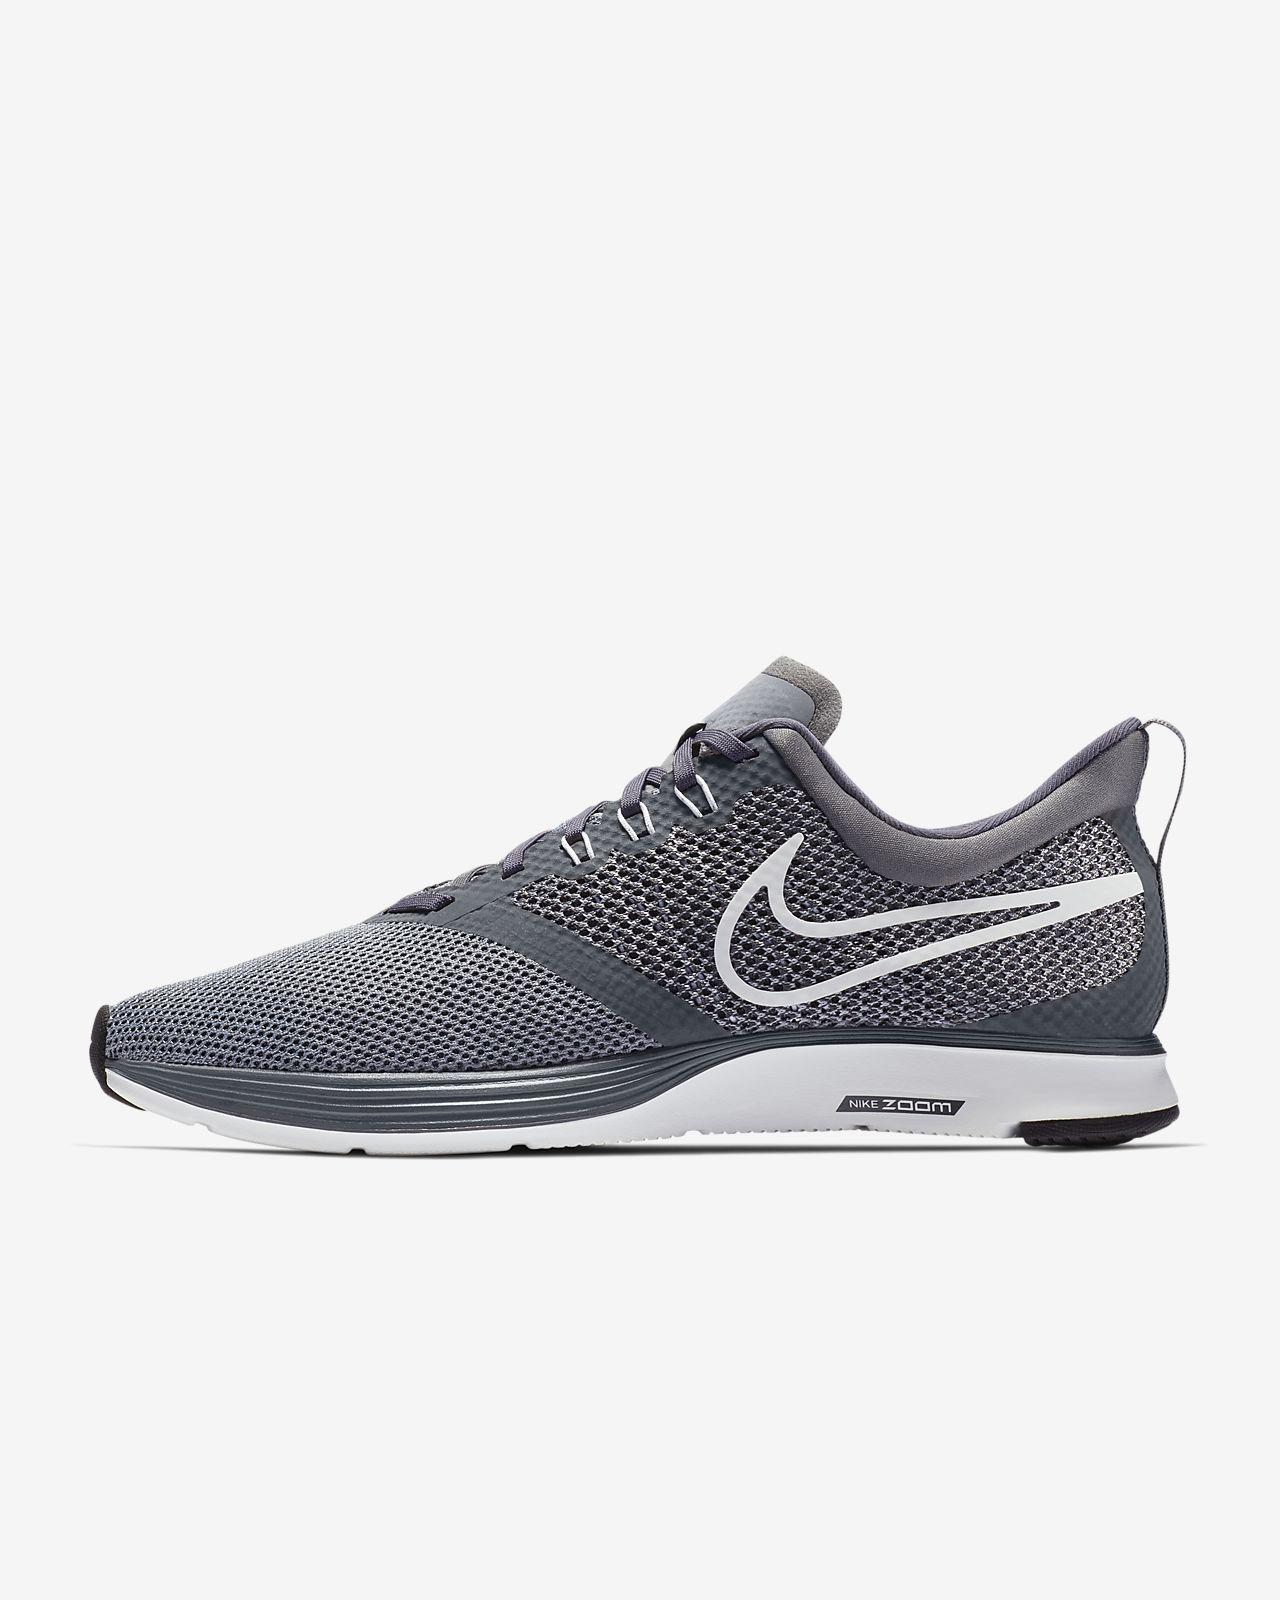 Adidas Light Running Shoe For Men